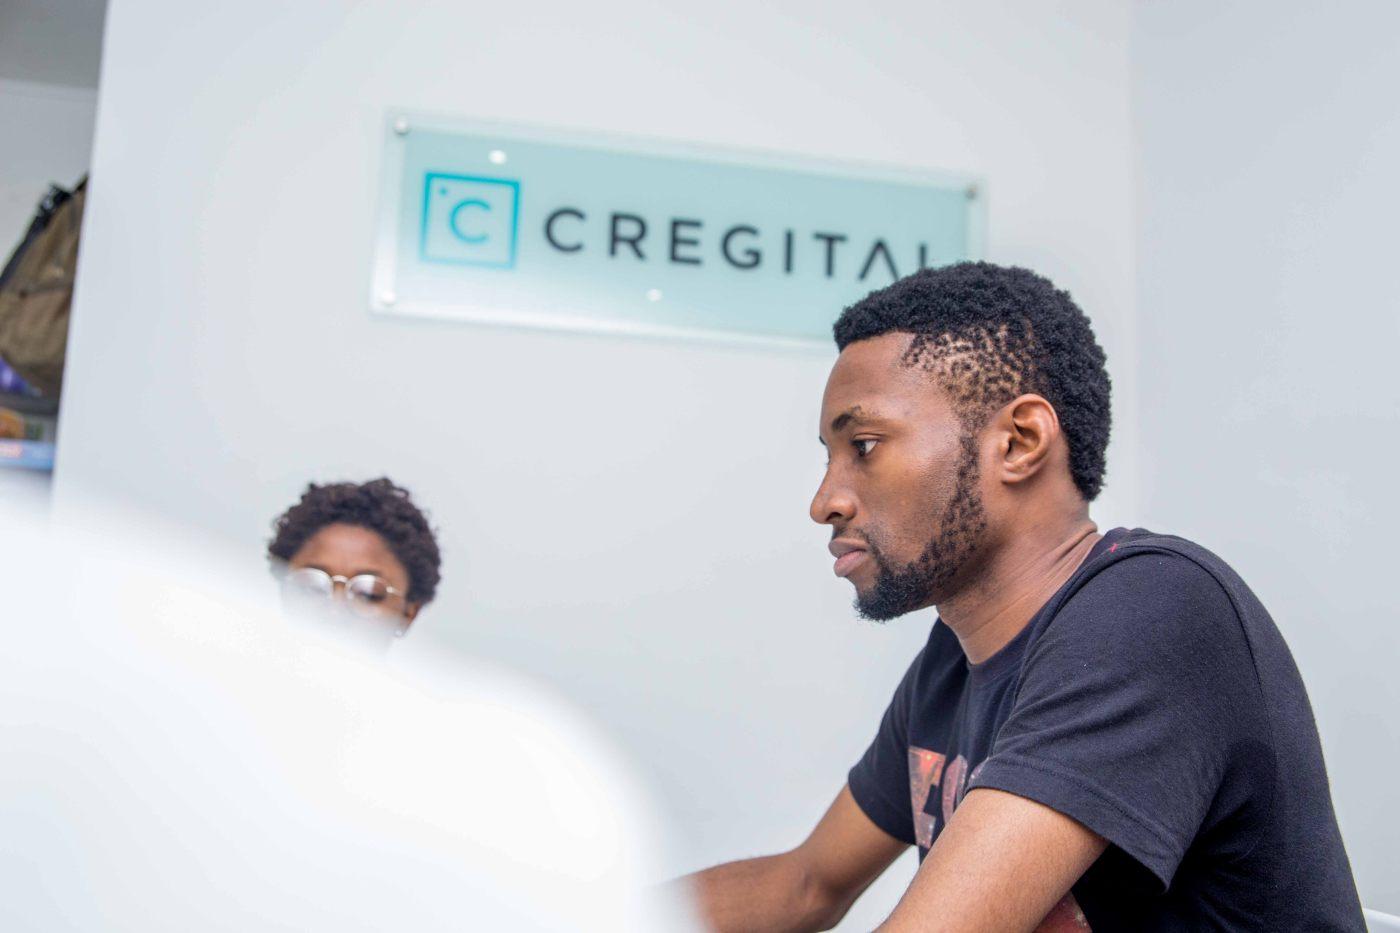 Cregital Design Agency Team 07 Evans Akanno